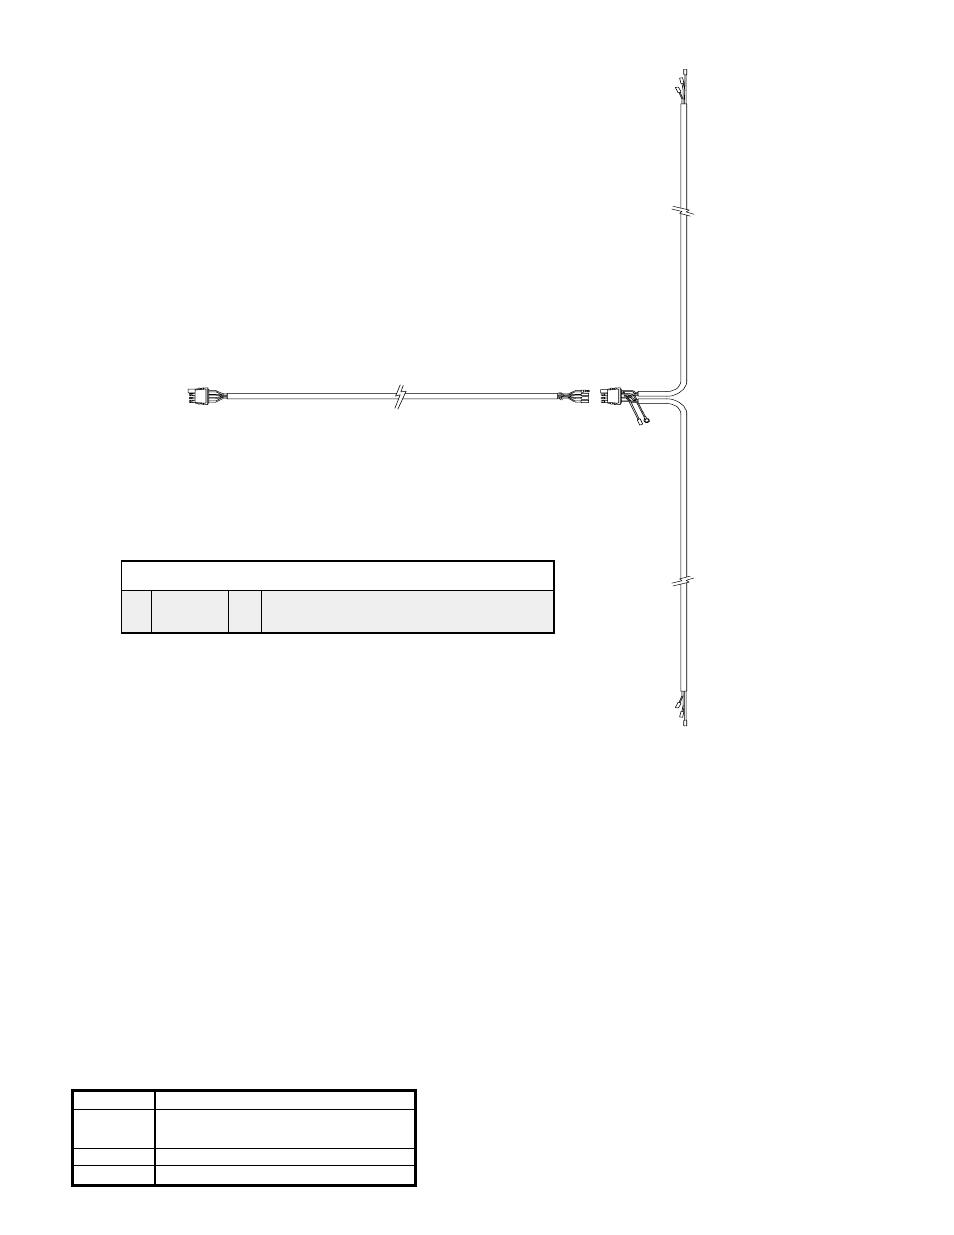 demco user manual daily instruction manual guides u2022 rh testingwordpress co Demco Tow Dolly Demco Grain Carts